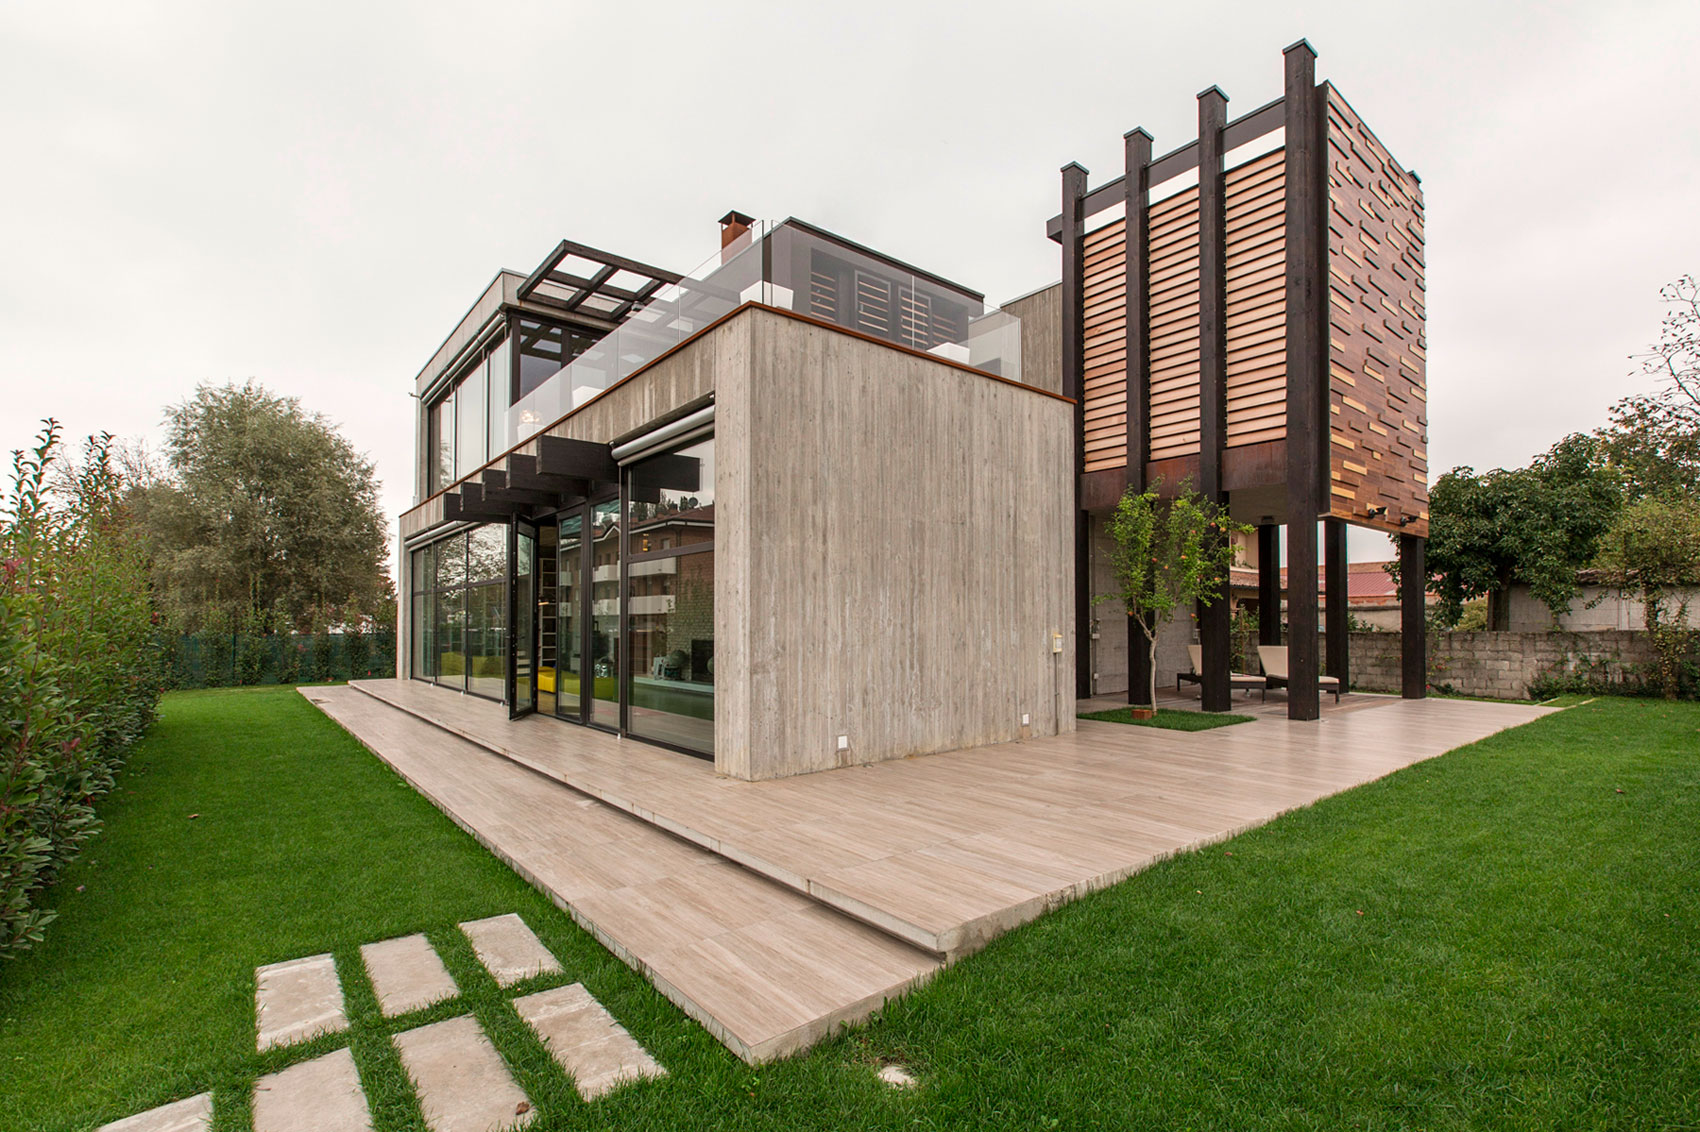 D'Autore Residence near Bologna by Giraldi Associati Architetti-10